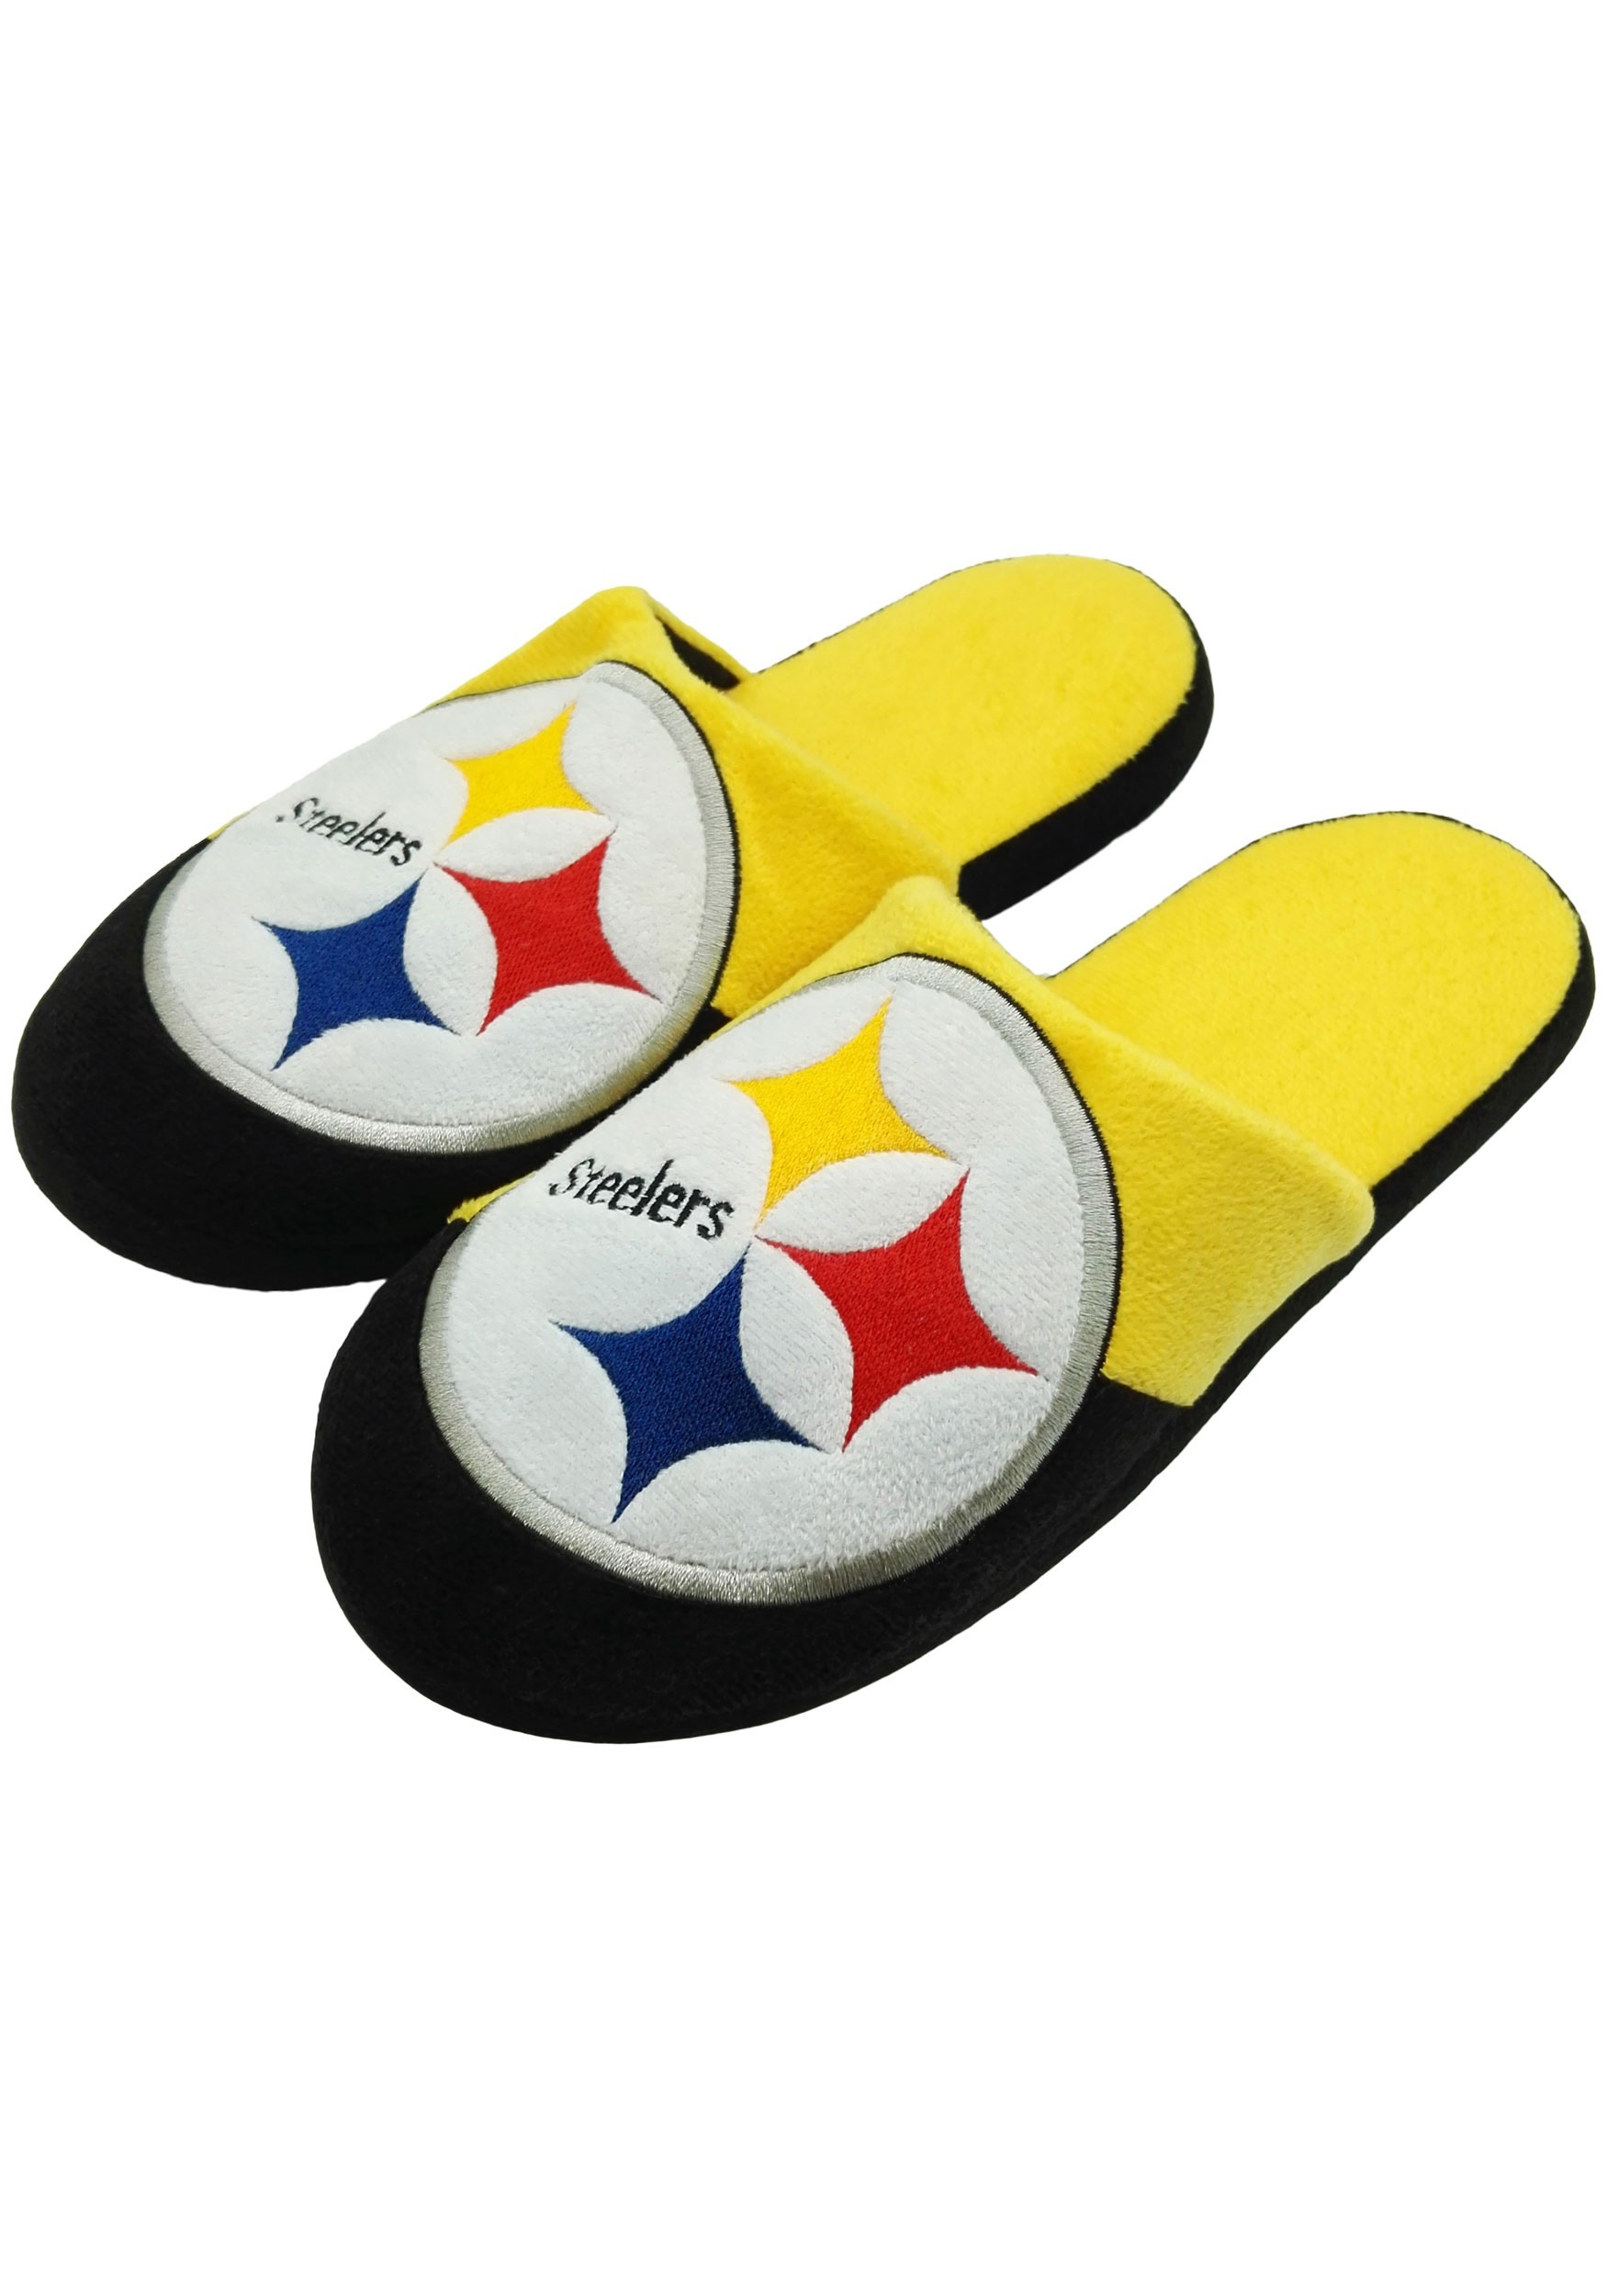 959245dc784 Pittsburgh Steelers Colorblock Slide Slippers